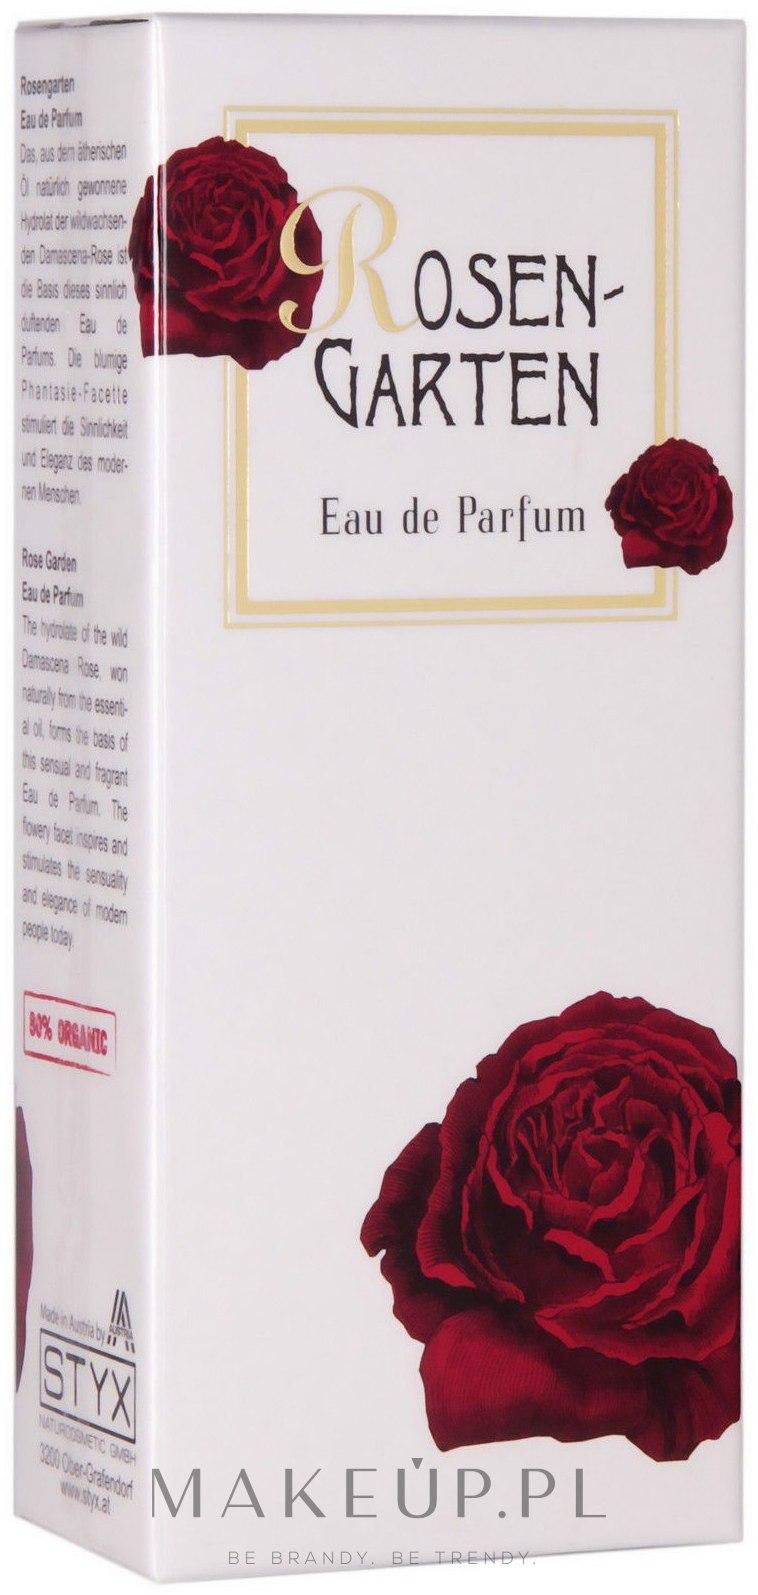 styx naturkosmetik rose-garden